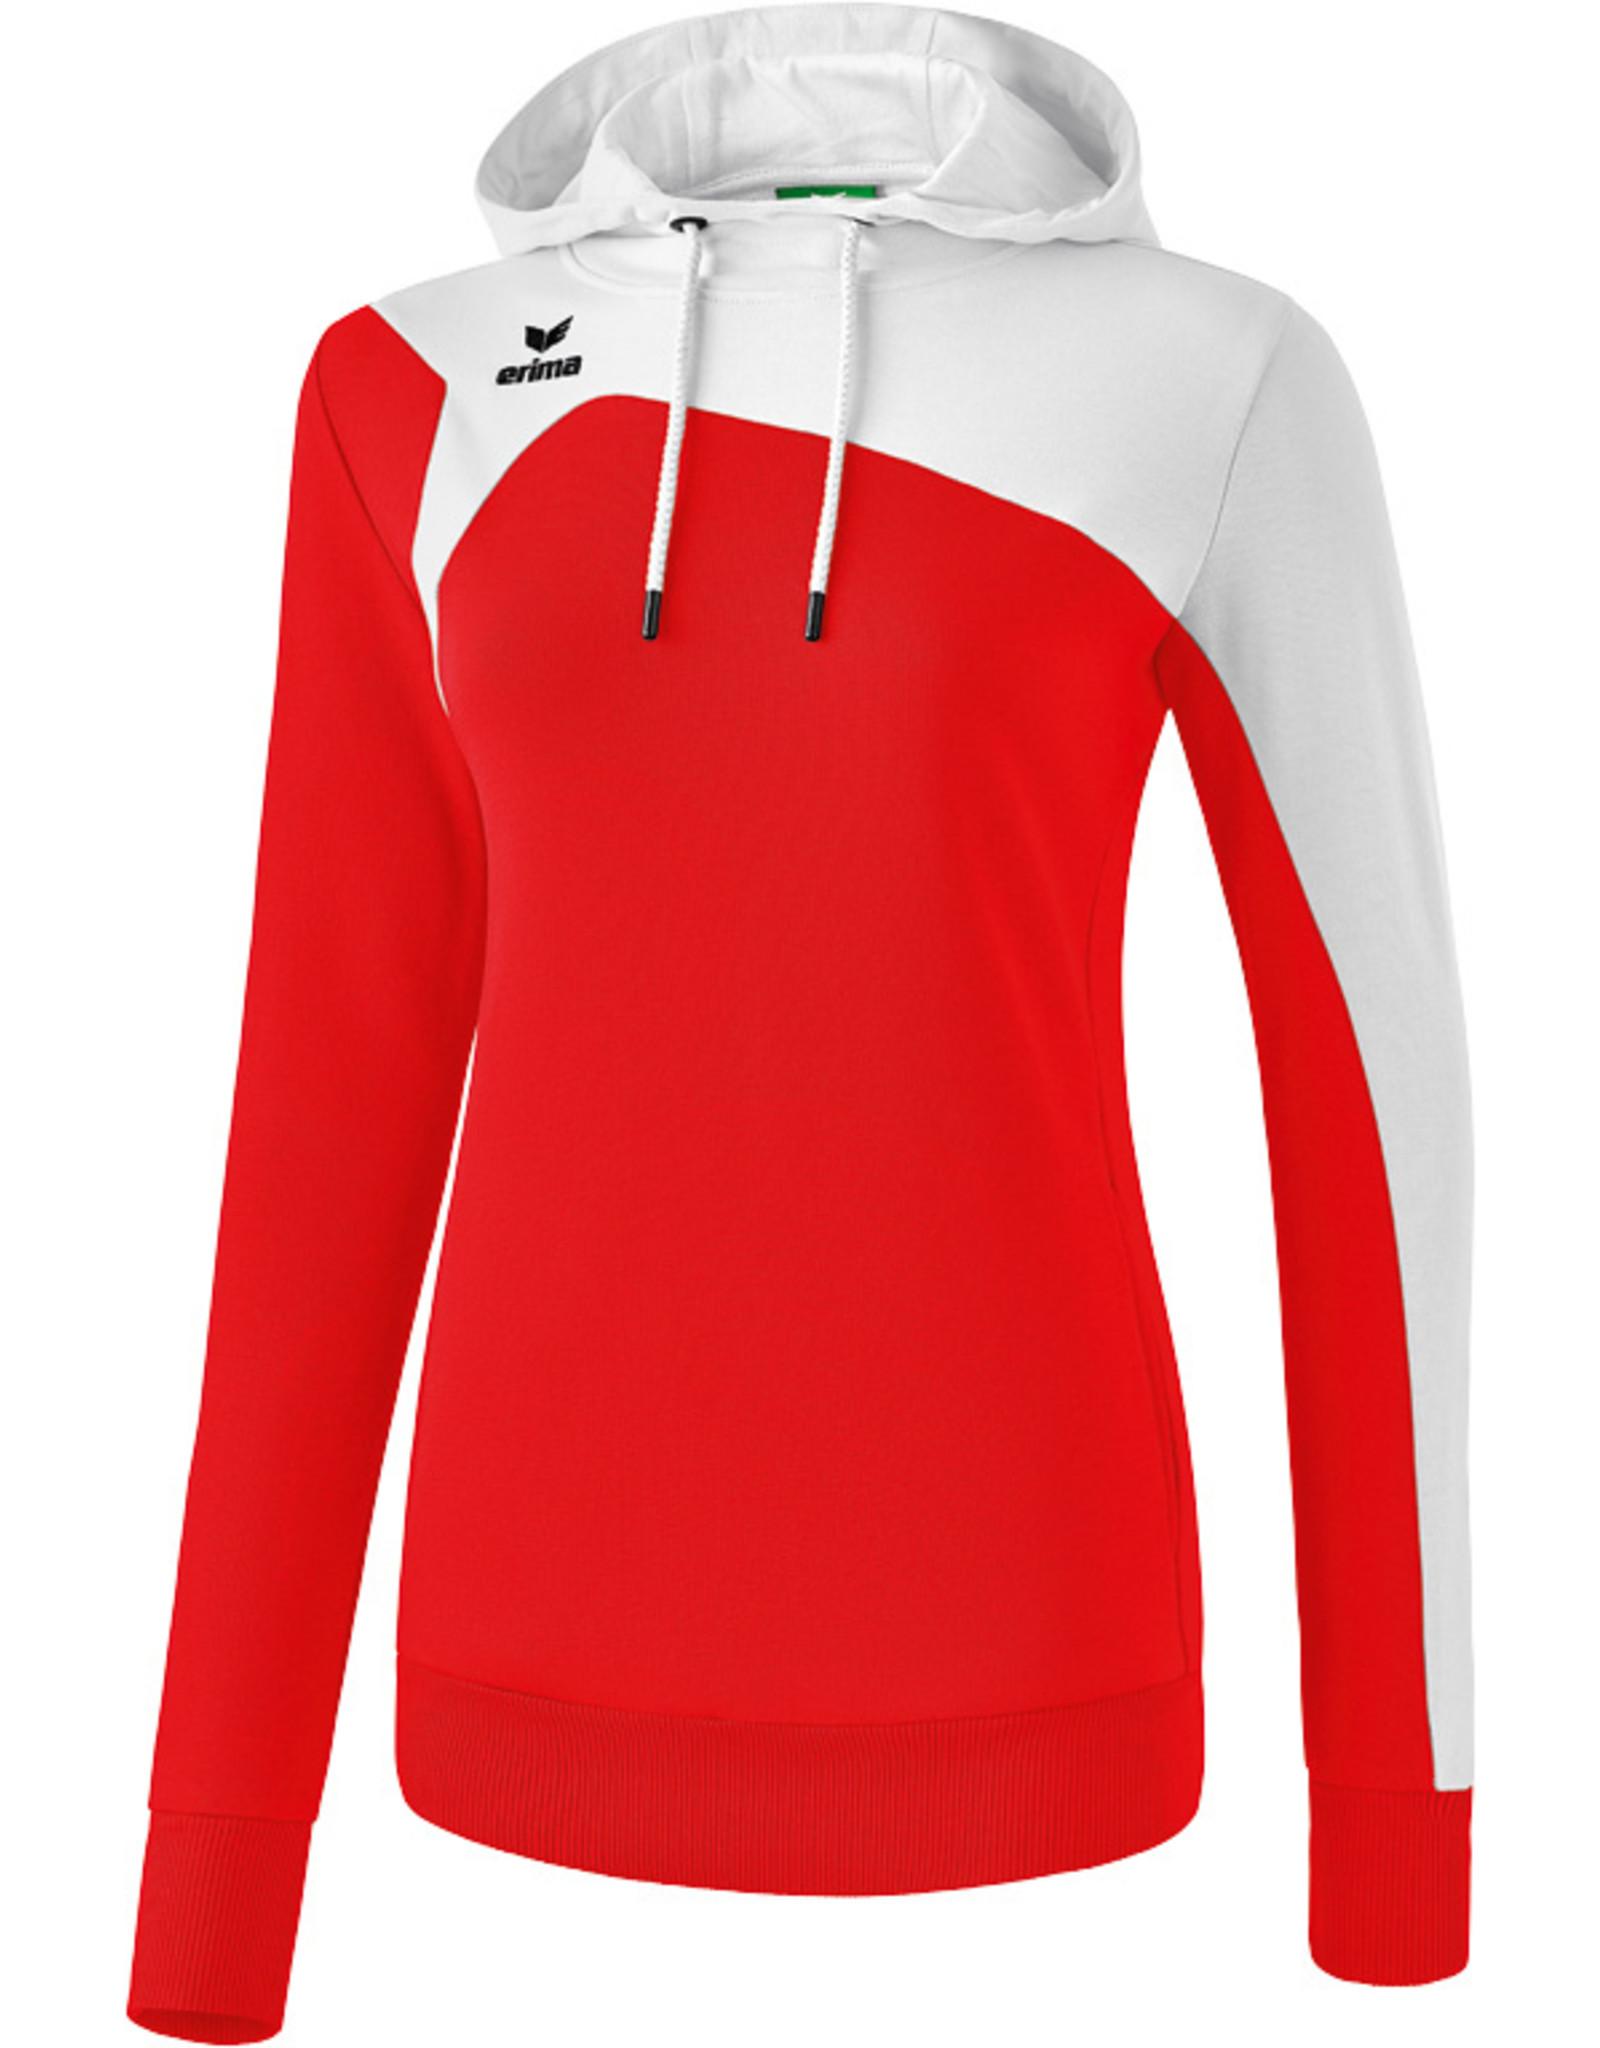 Erima CLUB 1900 2.0 hoodie-red/white-Dames